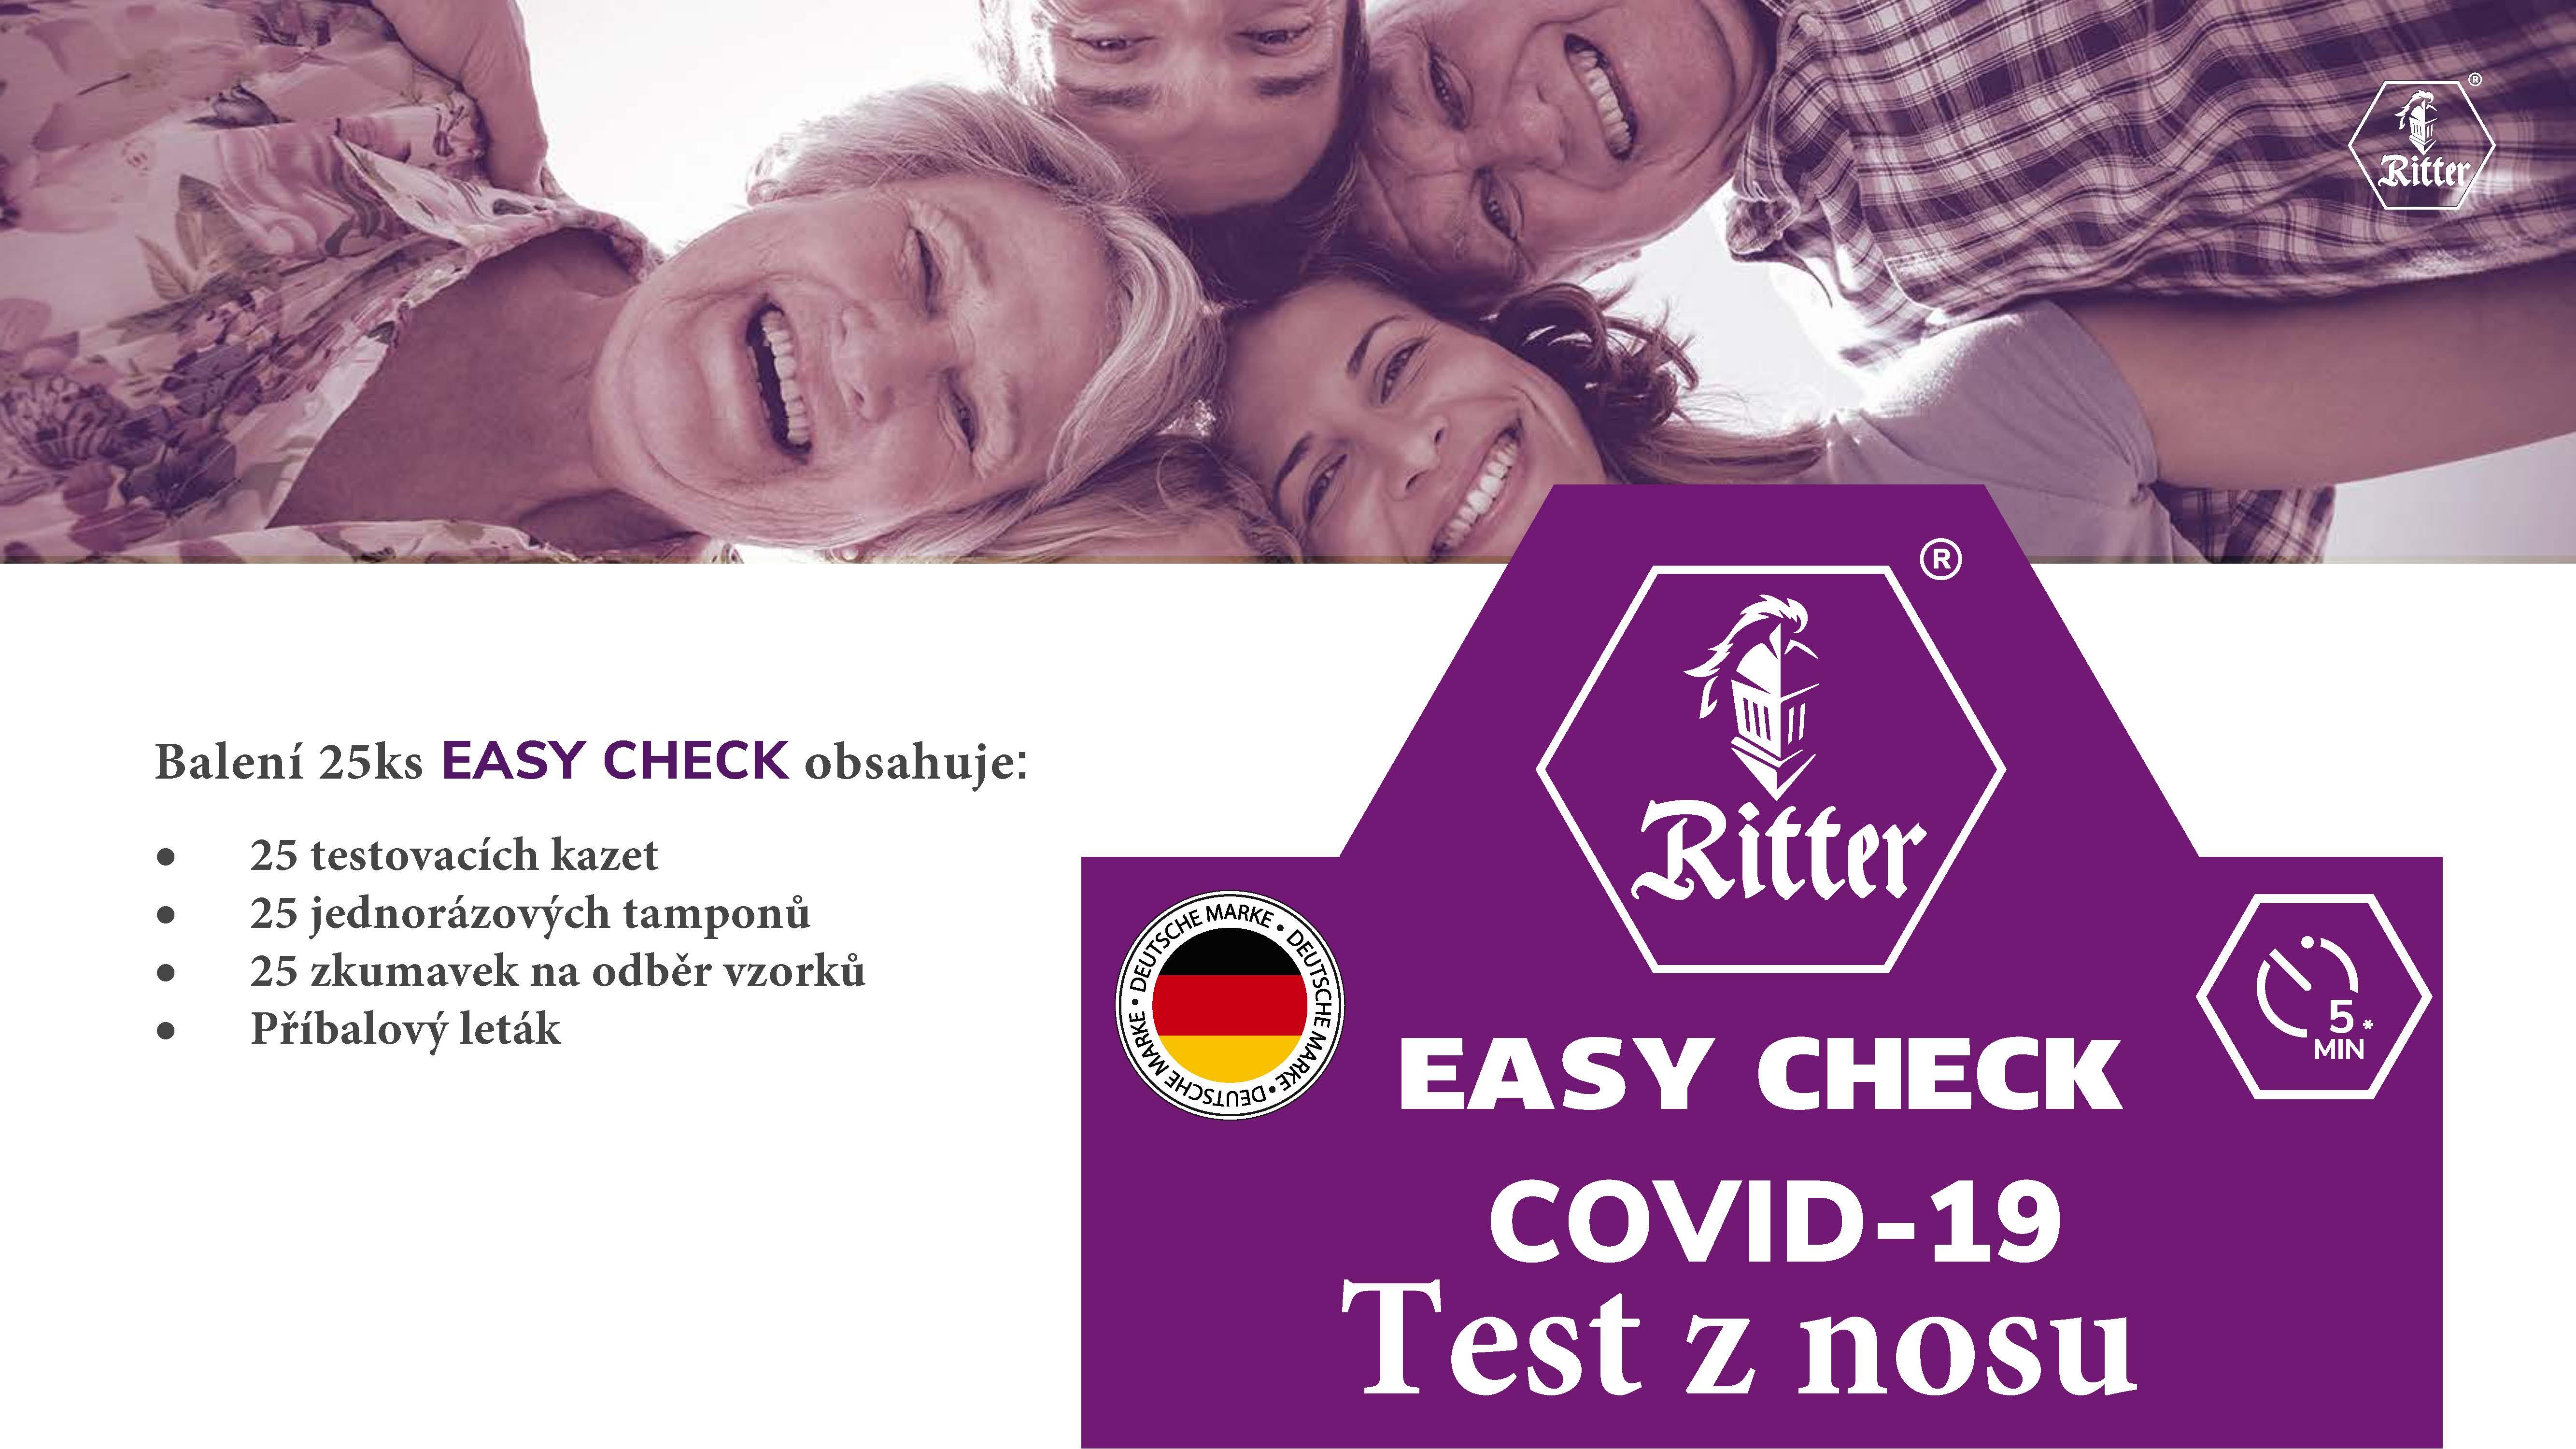 Ritter_EasyCheck_COVID19-Antigen_Nasaltest_PP (2) česky_Stránka_3